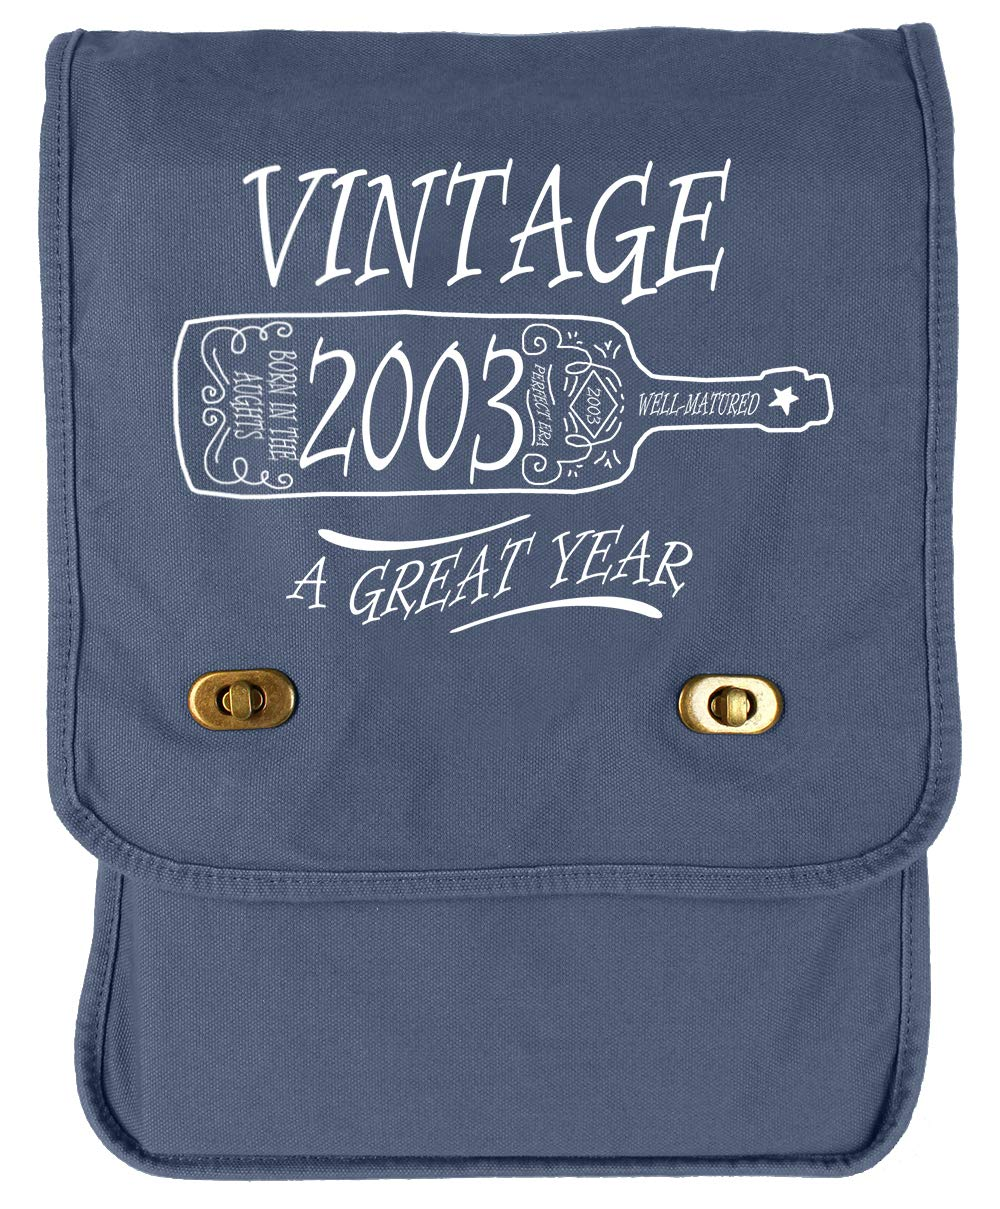 Tenacitee Aged Like a Fine Wine 2003 Grey Brushed Canvas Messenger Bag